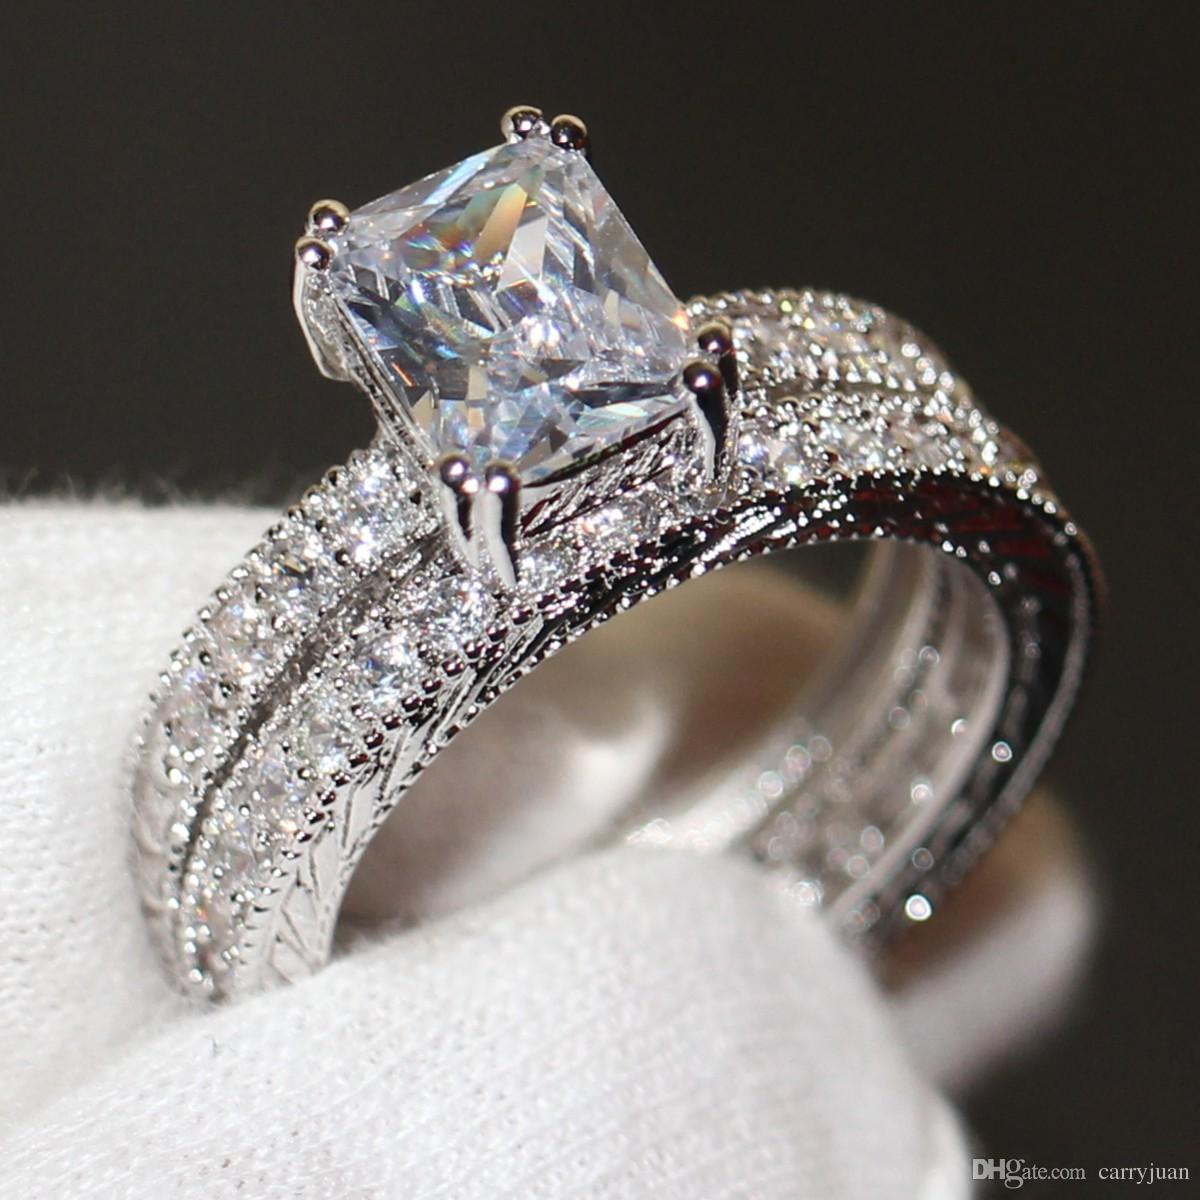 15d195c603c 2019 Size 5 10 Vintage Fashion Jewelry 10KT White Gold Filled Princess Cut  5A White Topaz CZ Diamond Retro Women Weding Bridal Band Ring Set Gift From  ...